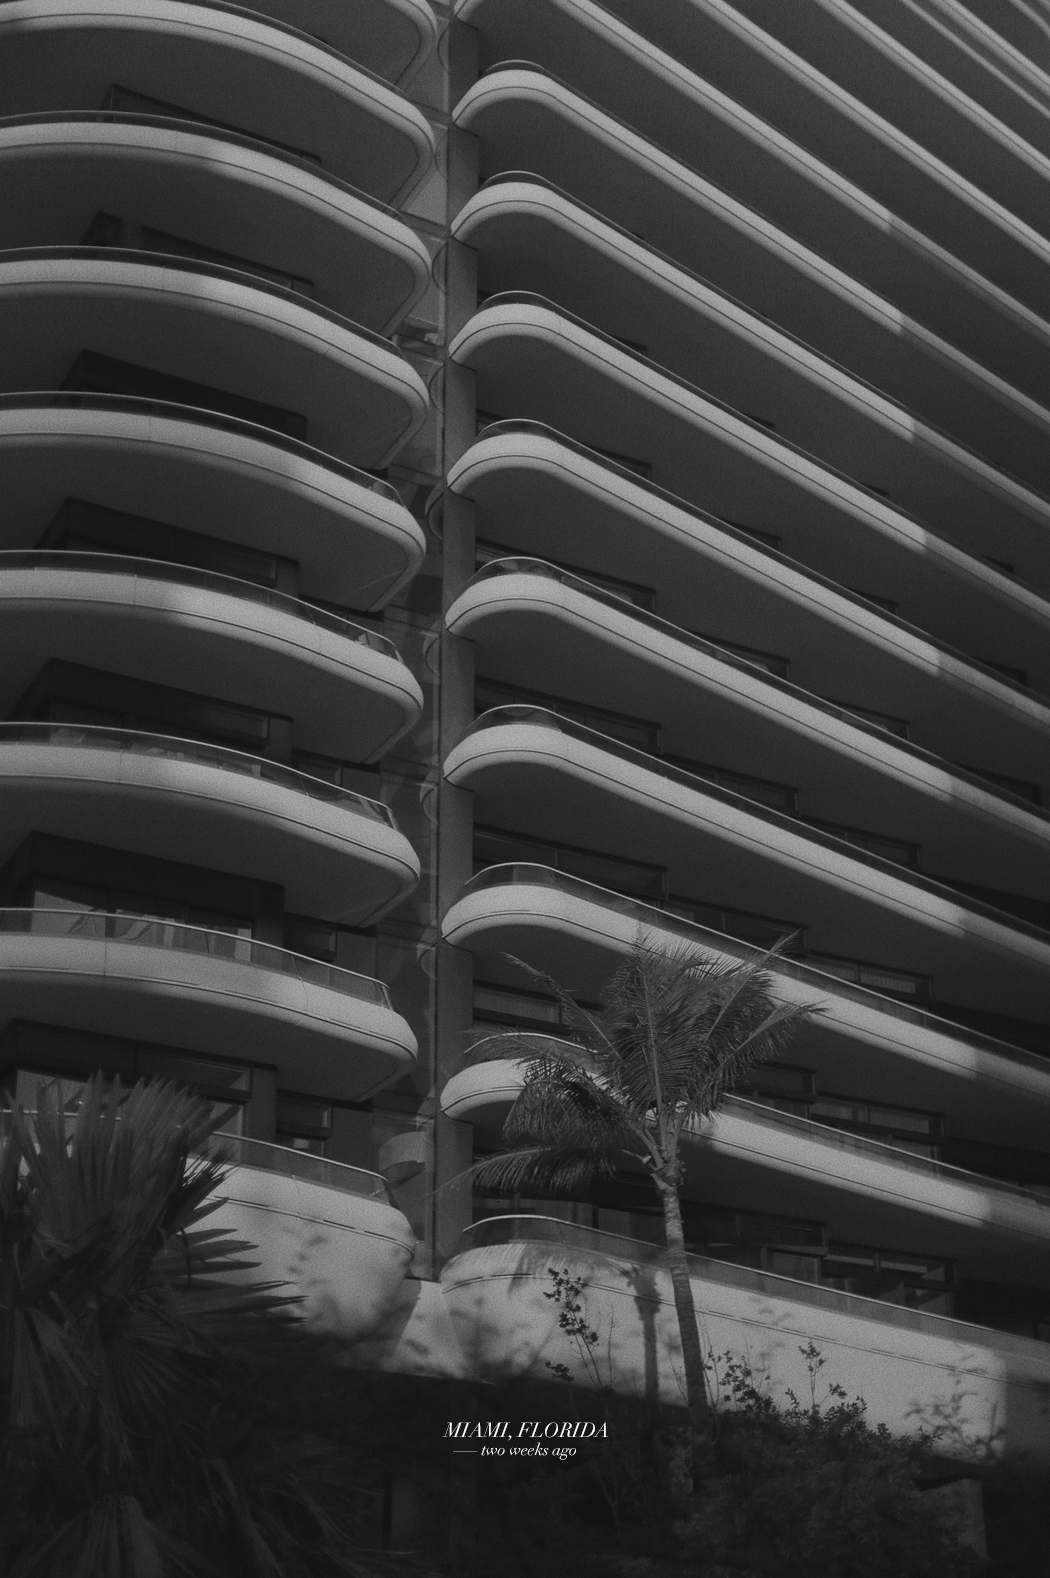 Miami Beach, Florida - Art Basel 2017 - Fiona Dinkelbach